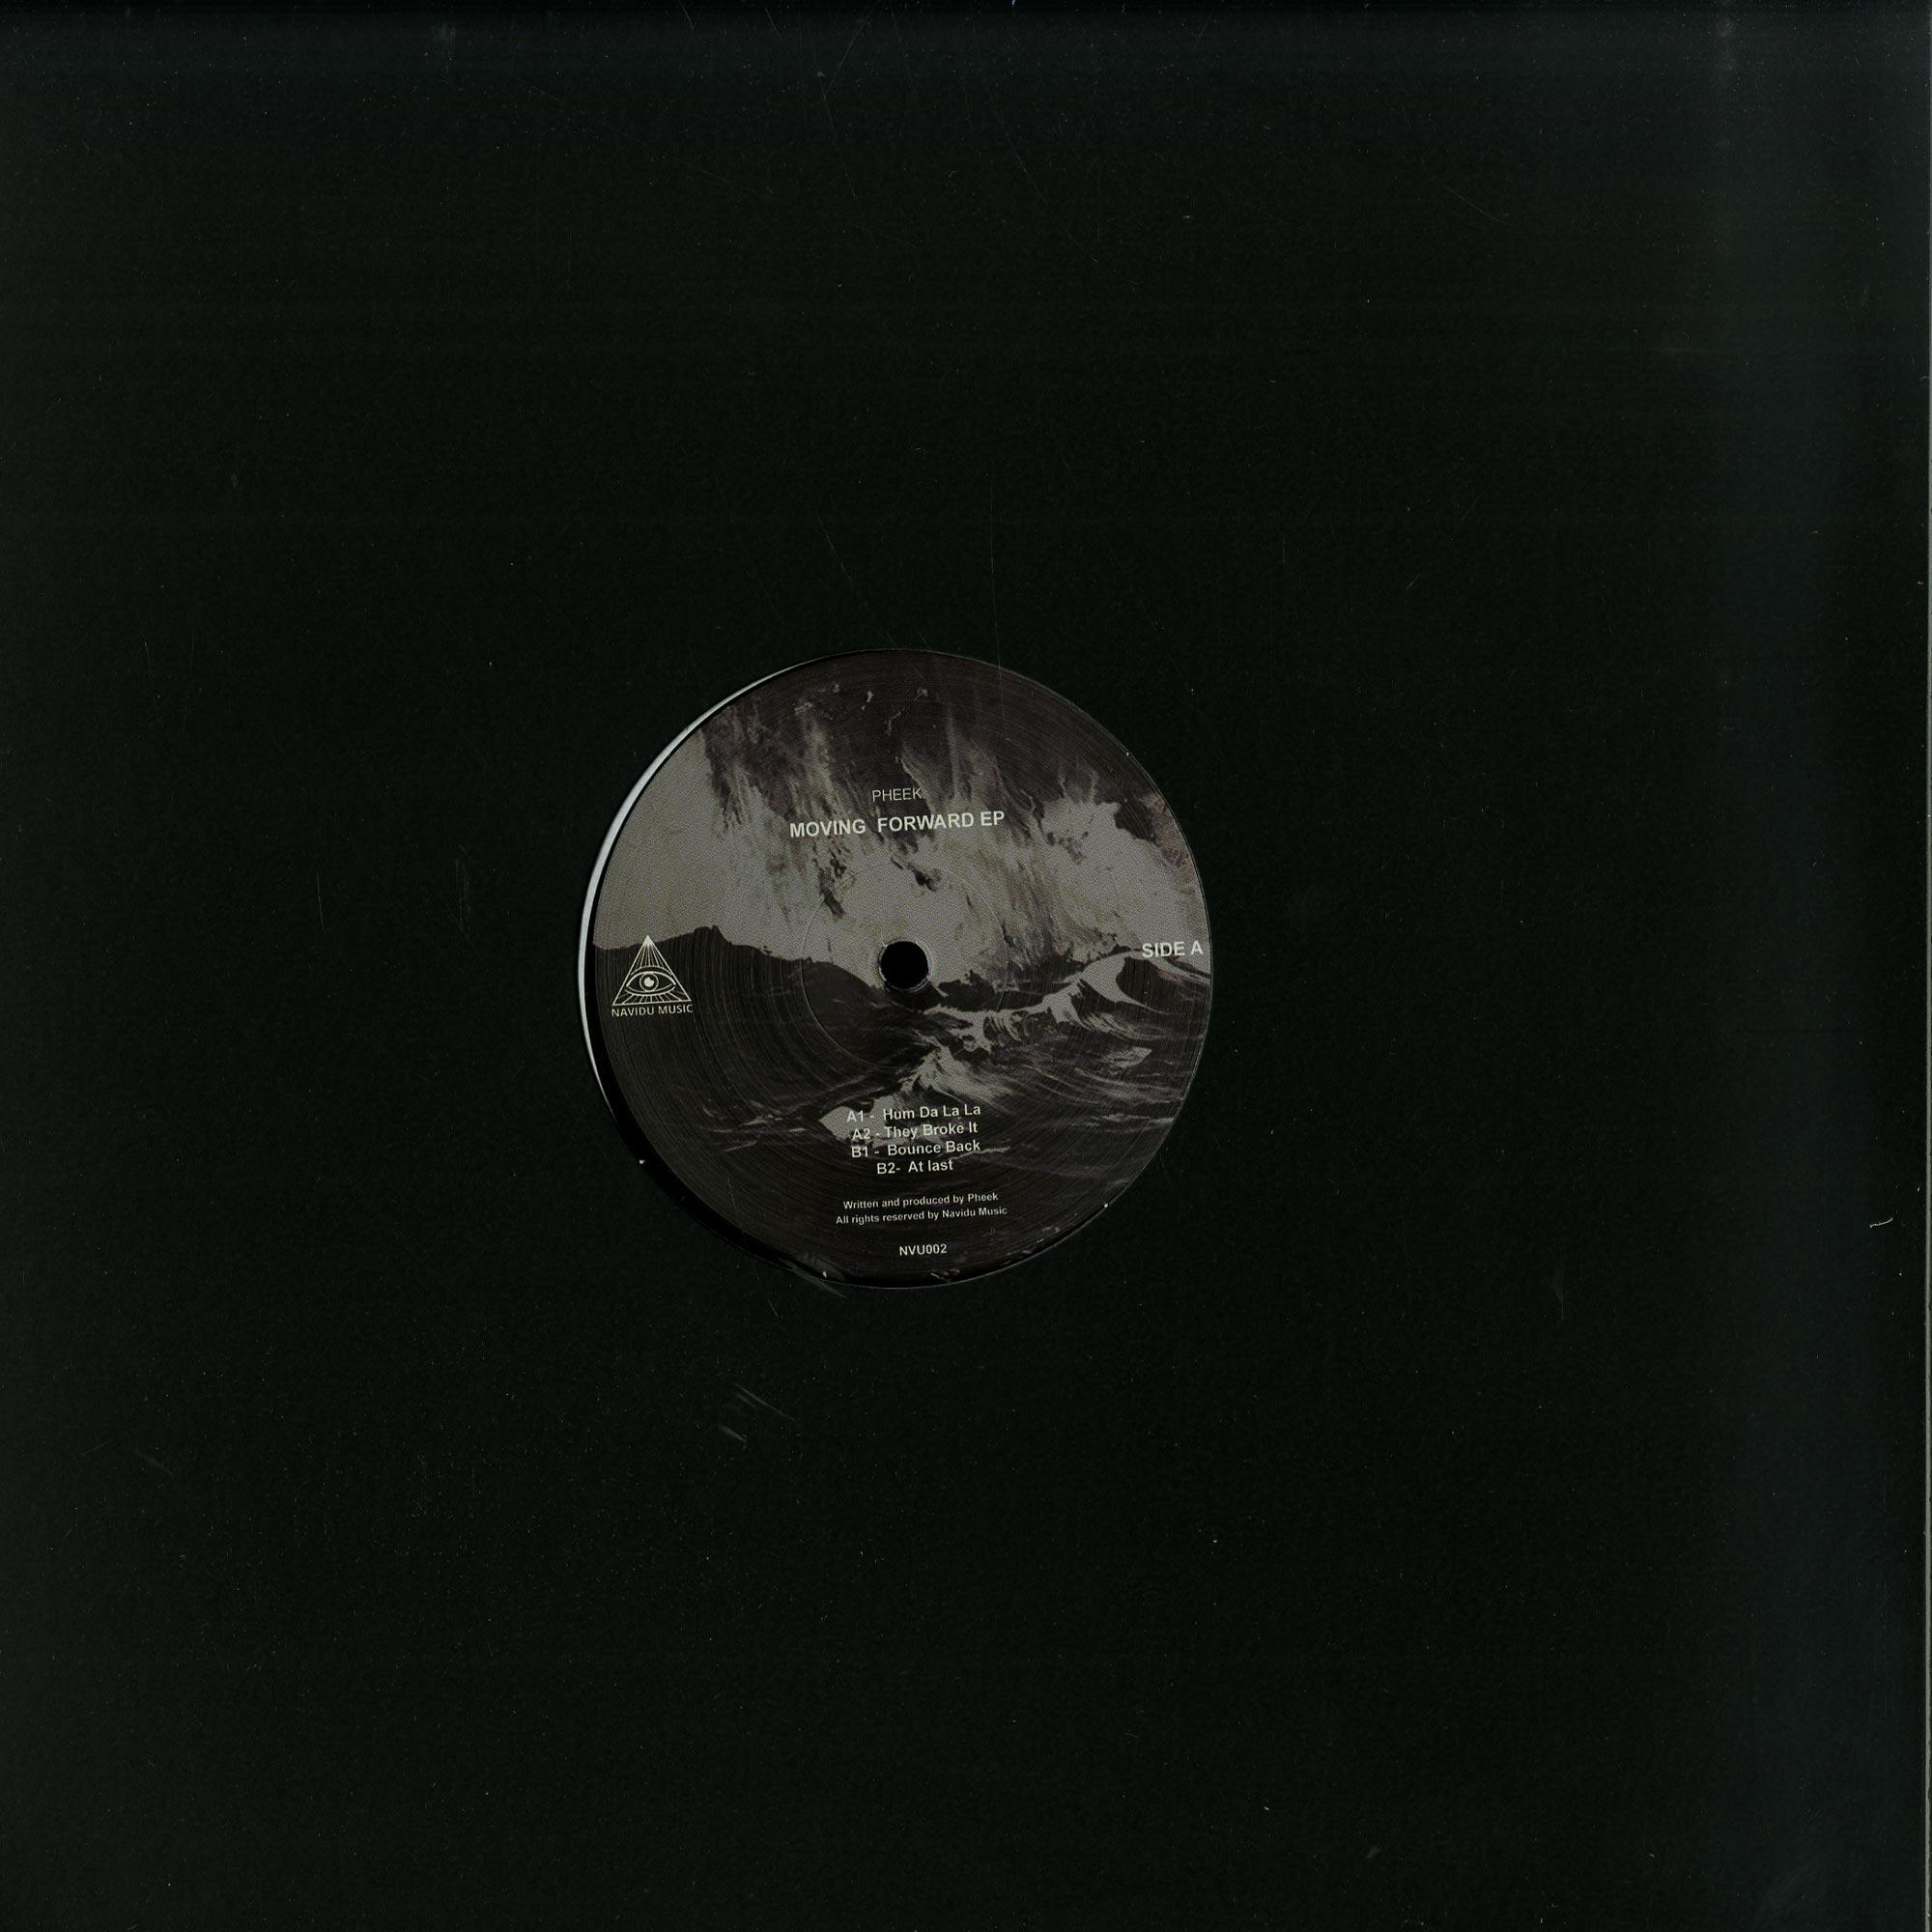 Pheek - MOVING FORWARD EP